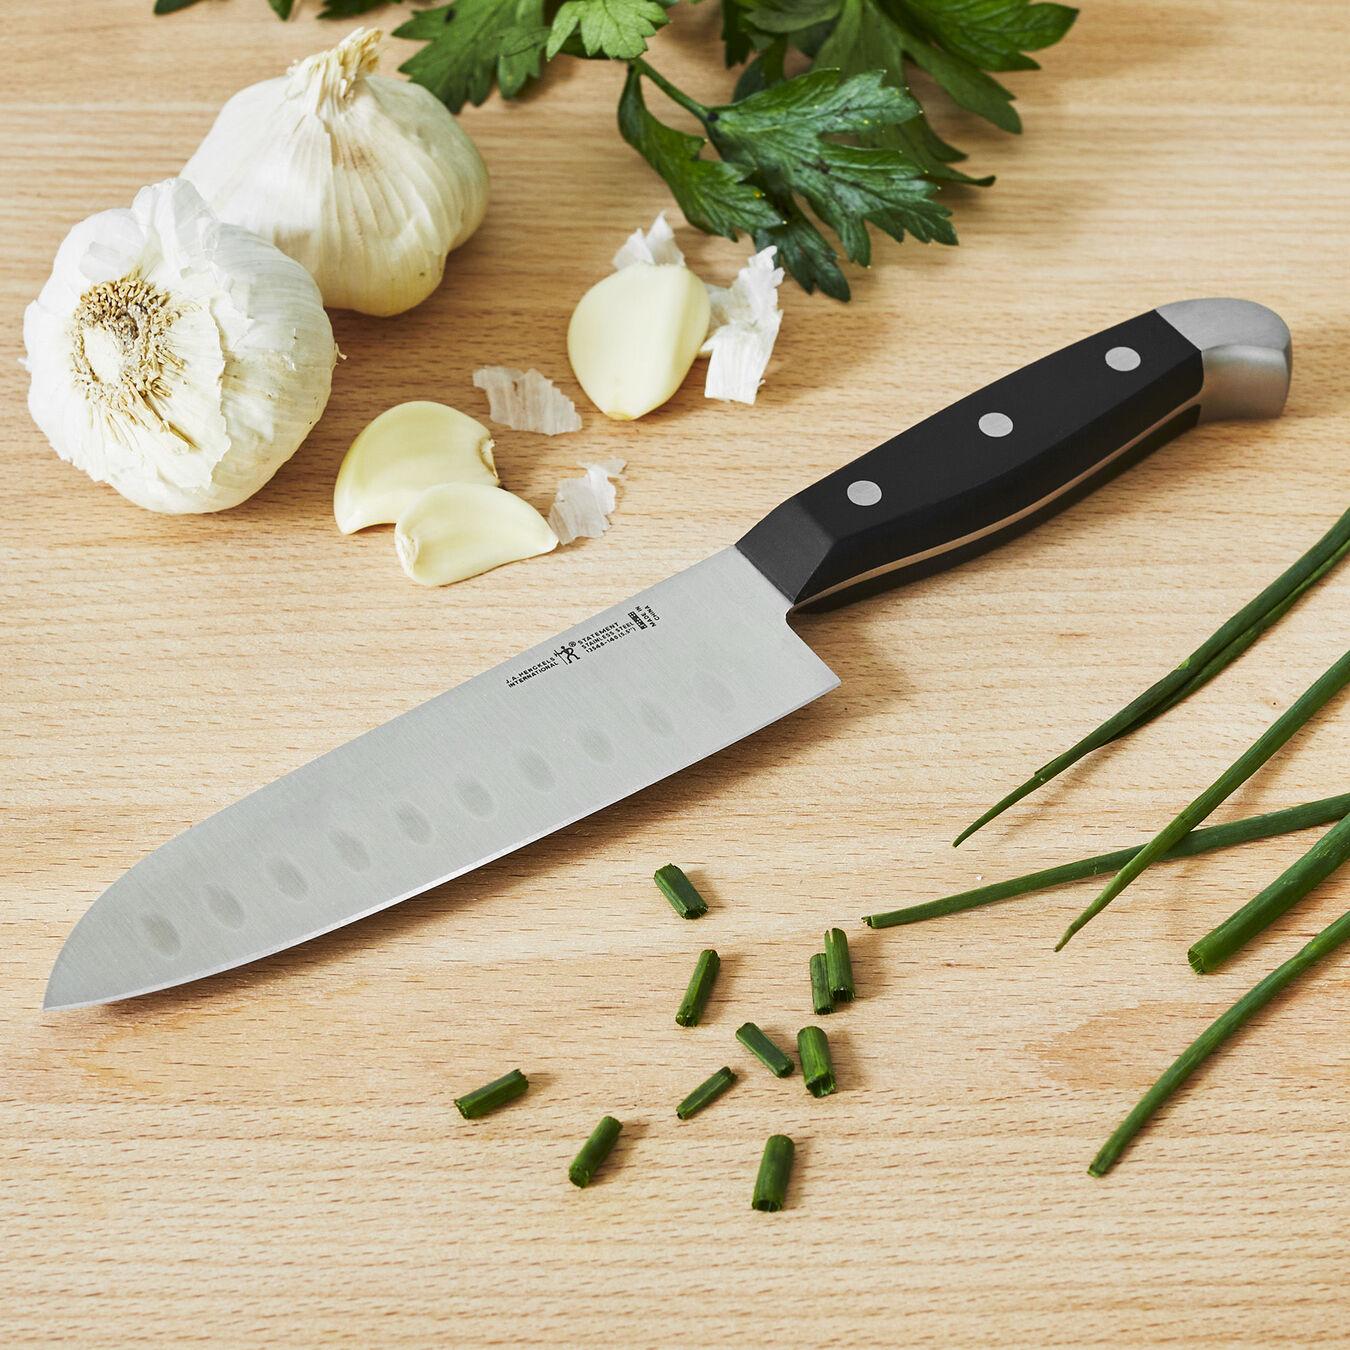 7-inch, Hollow Edge Santoku Knife,,large 2